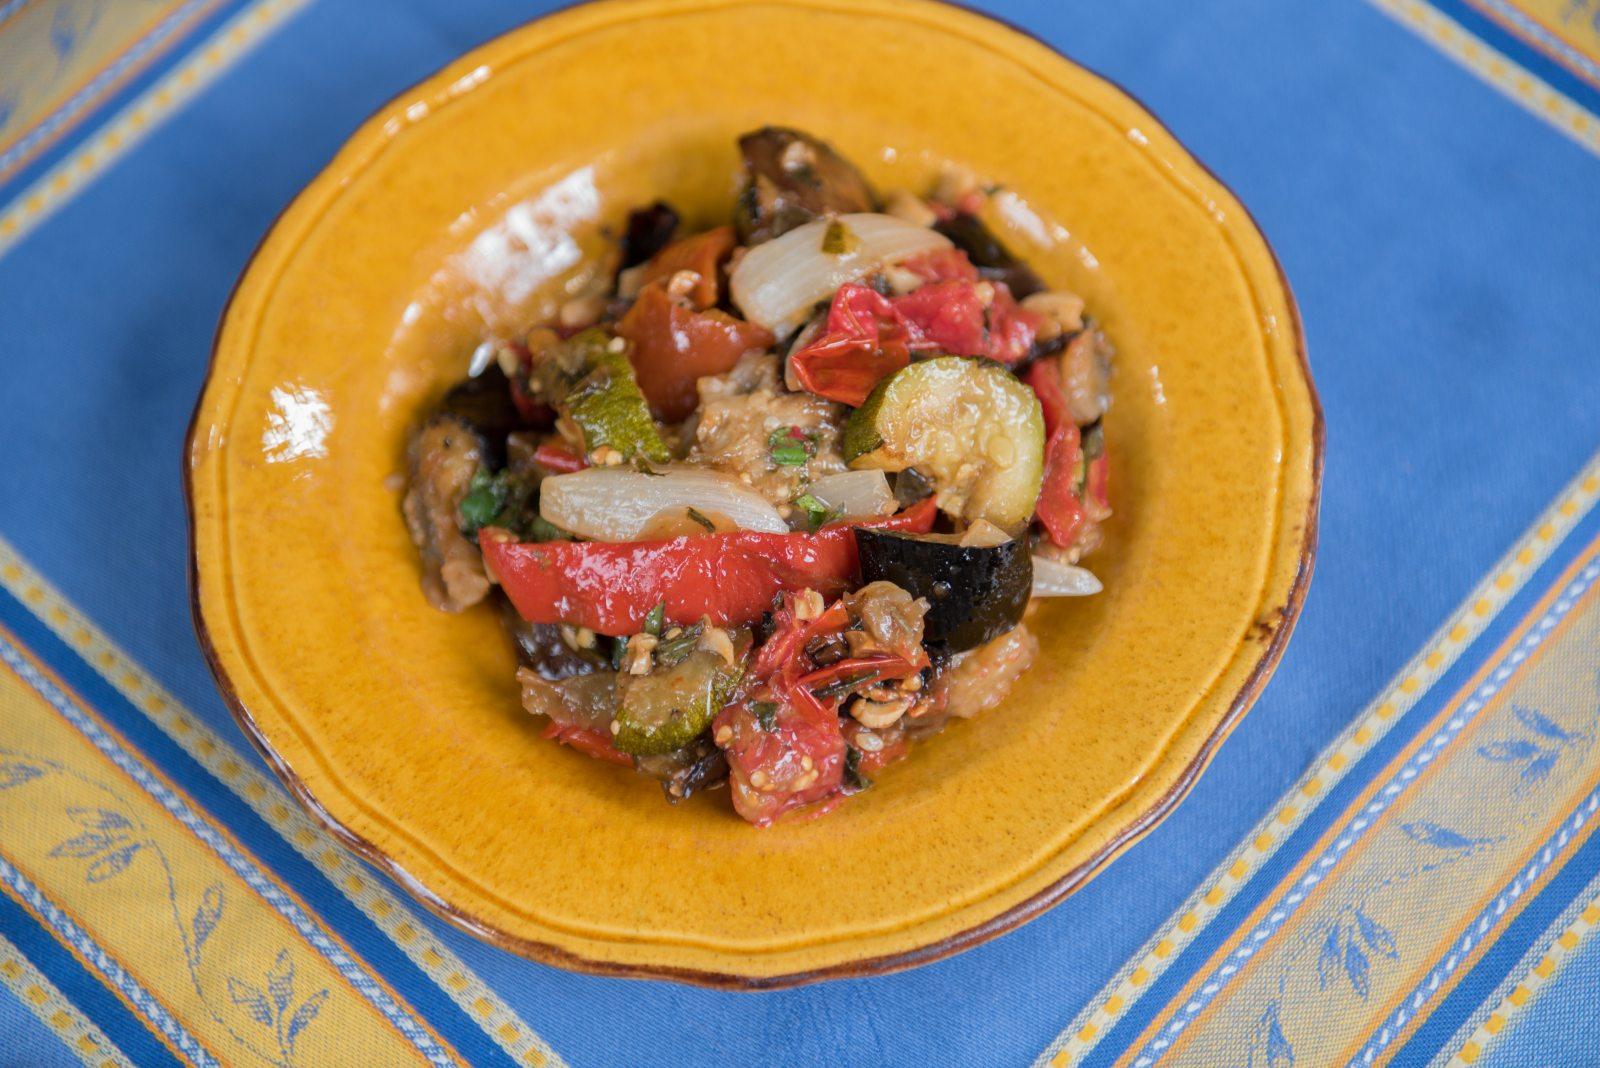 Grilled Summer Ratatouille